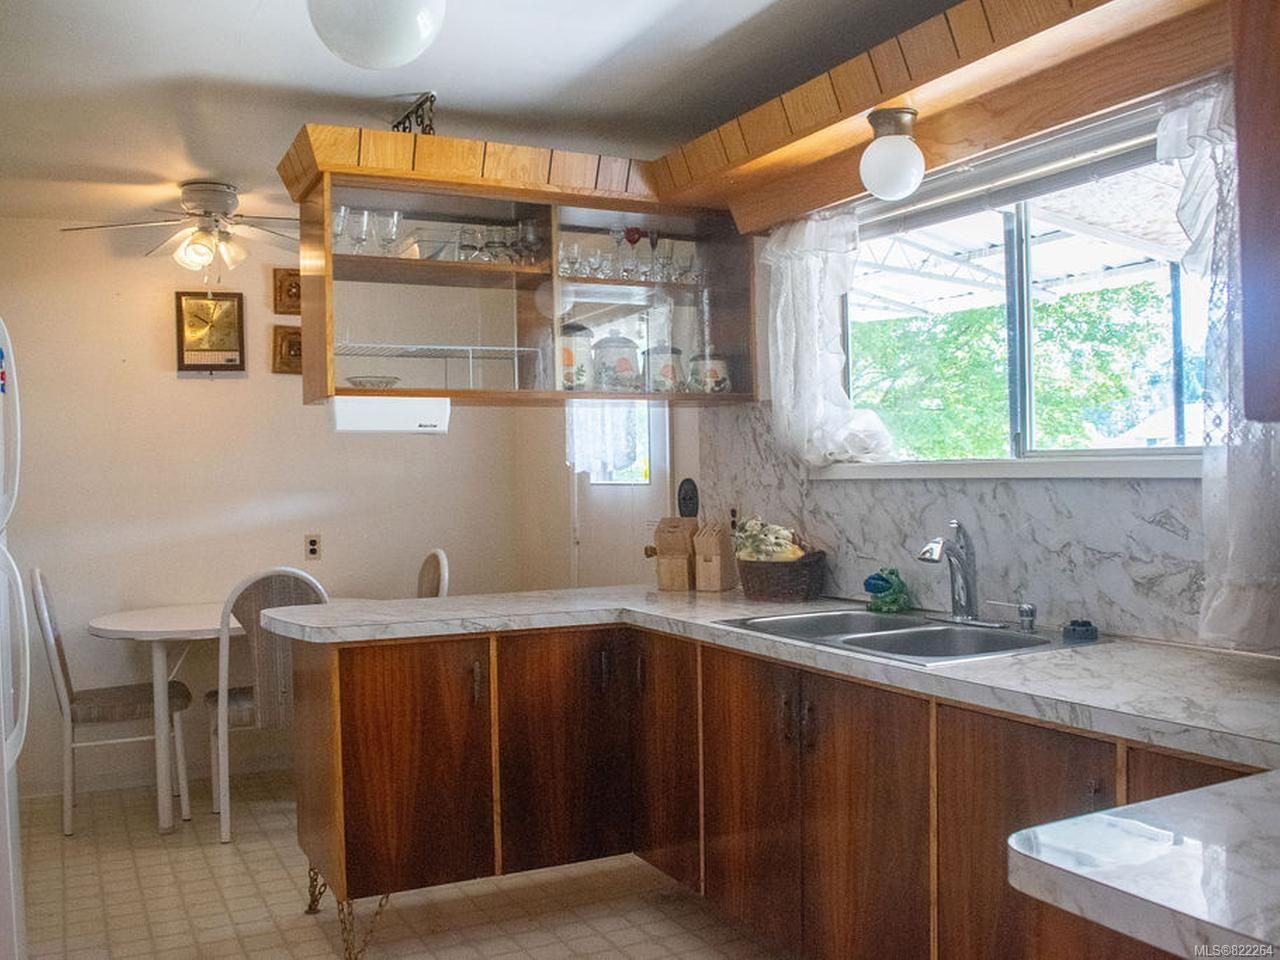 Photo 5: Photos: 4150 Rex Rd in PORT ALBERNI: PA Port Alberni House for sale (Port Alberni)  : MLS®# 822264